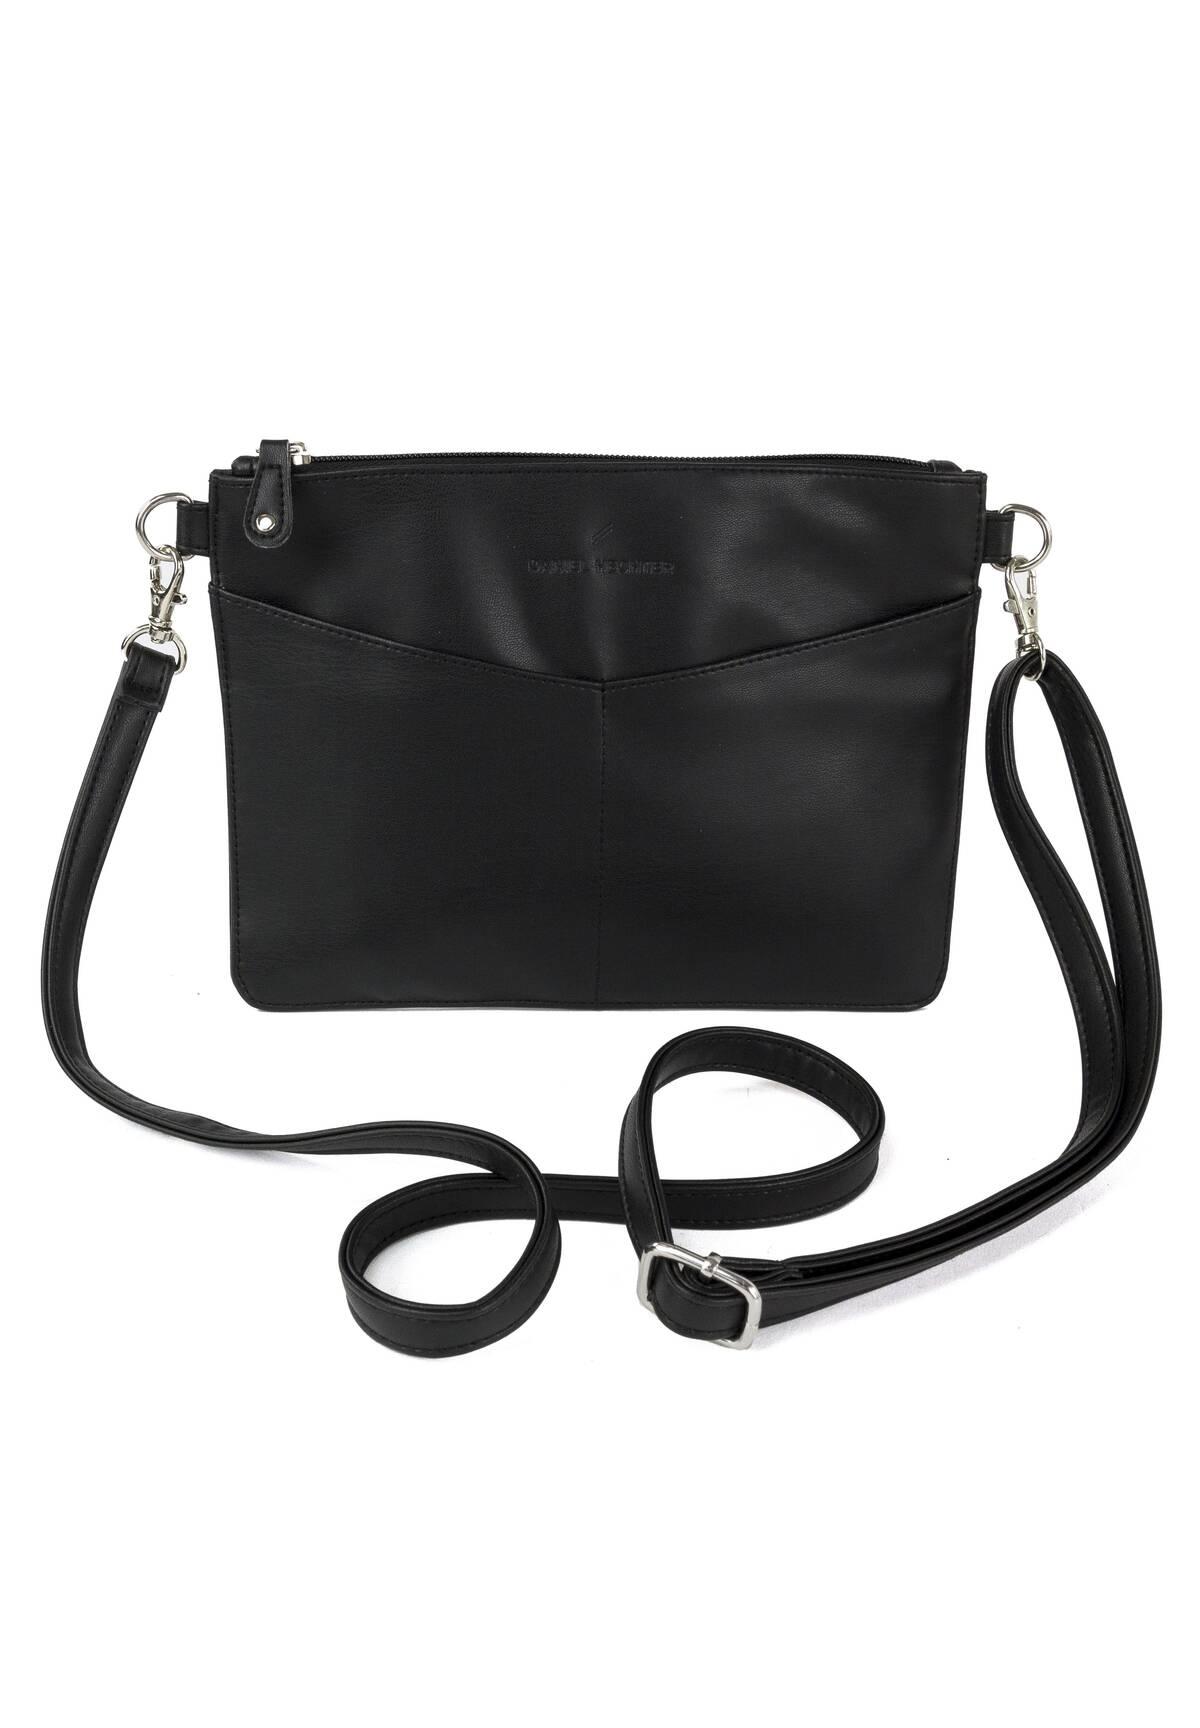 Elegante Clutch / Elegant Clutch Bag